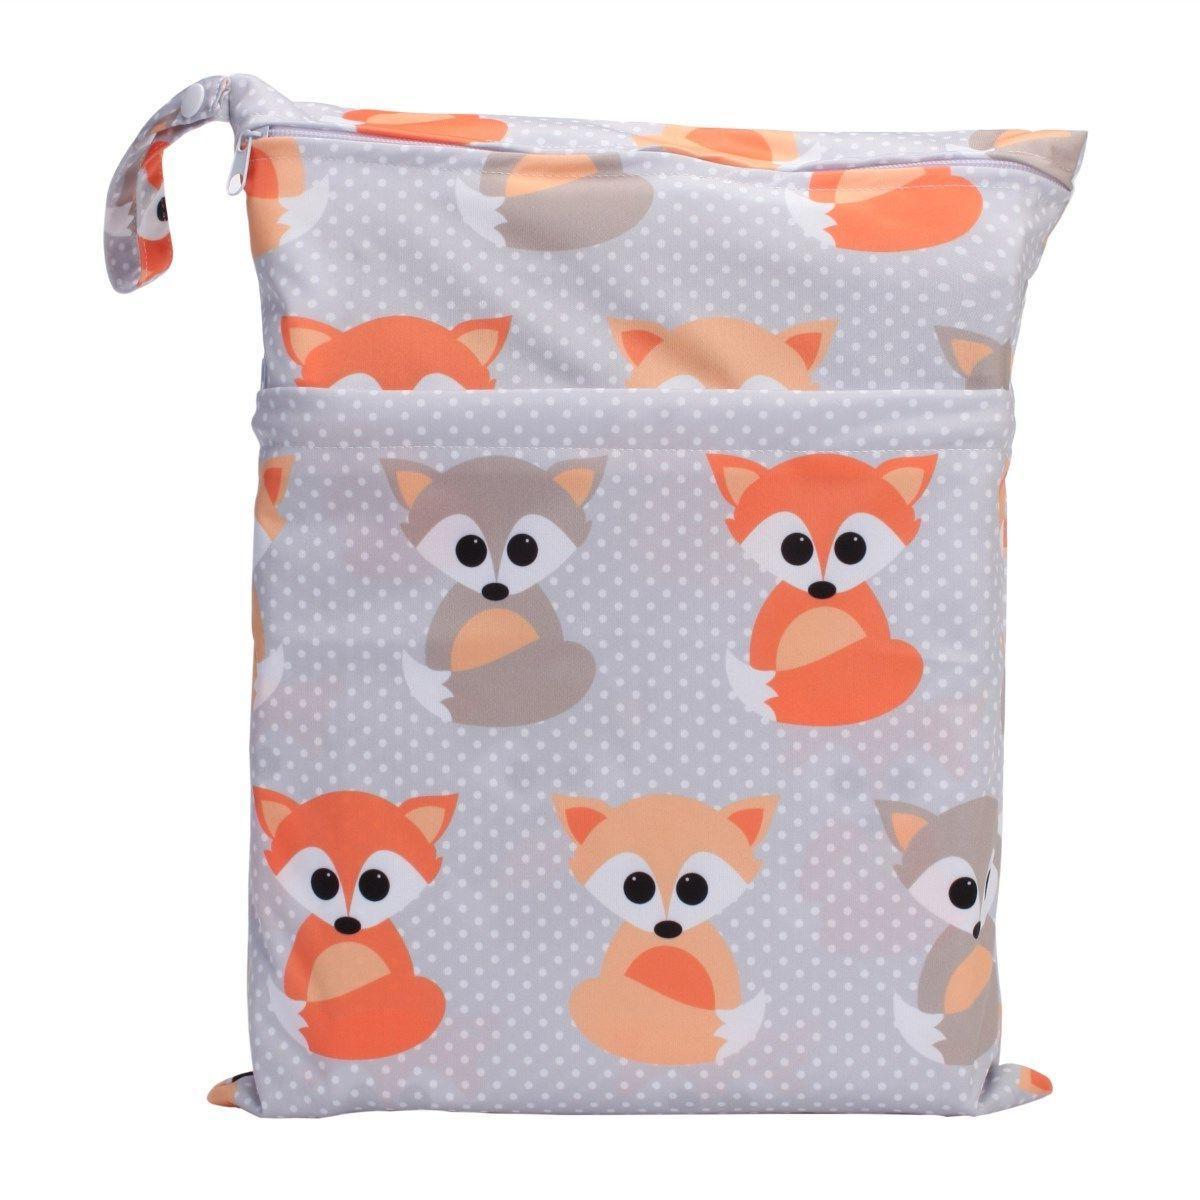 U Pick Bag Baby Cloth Nappy Bag Two Zipper Pockets